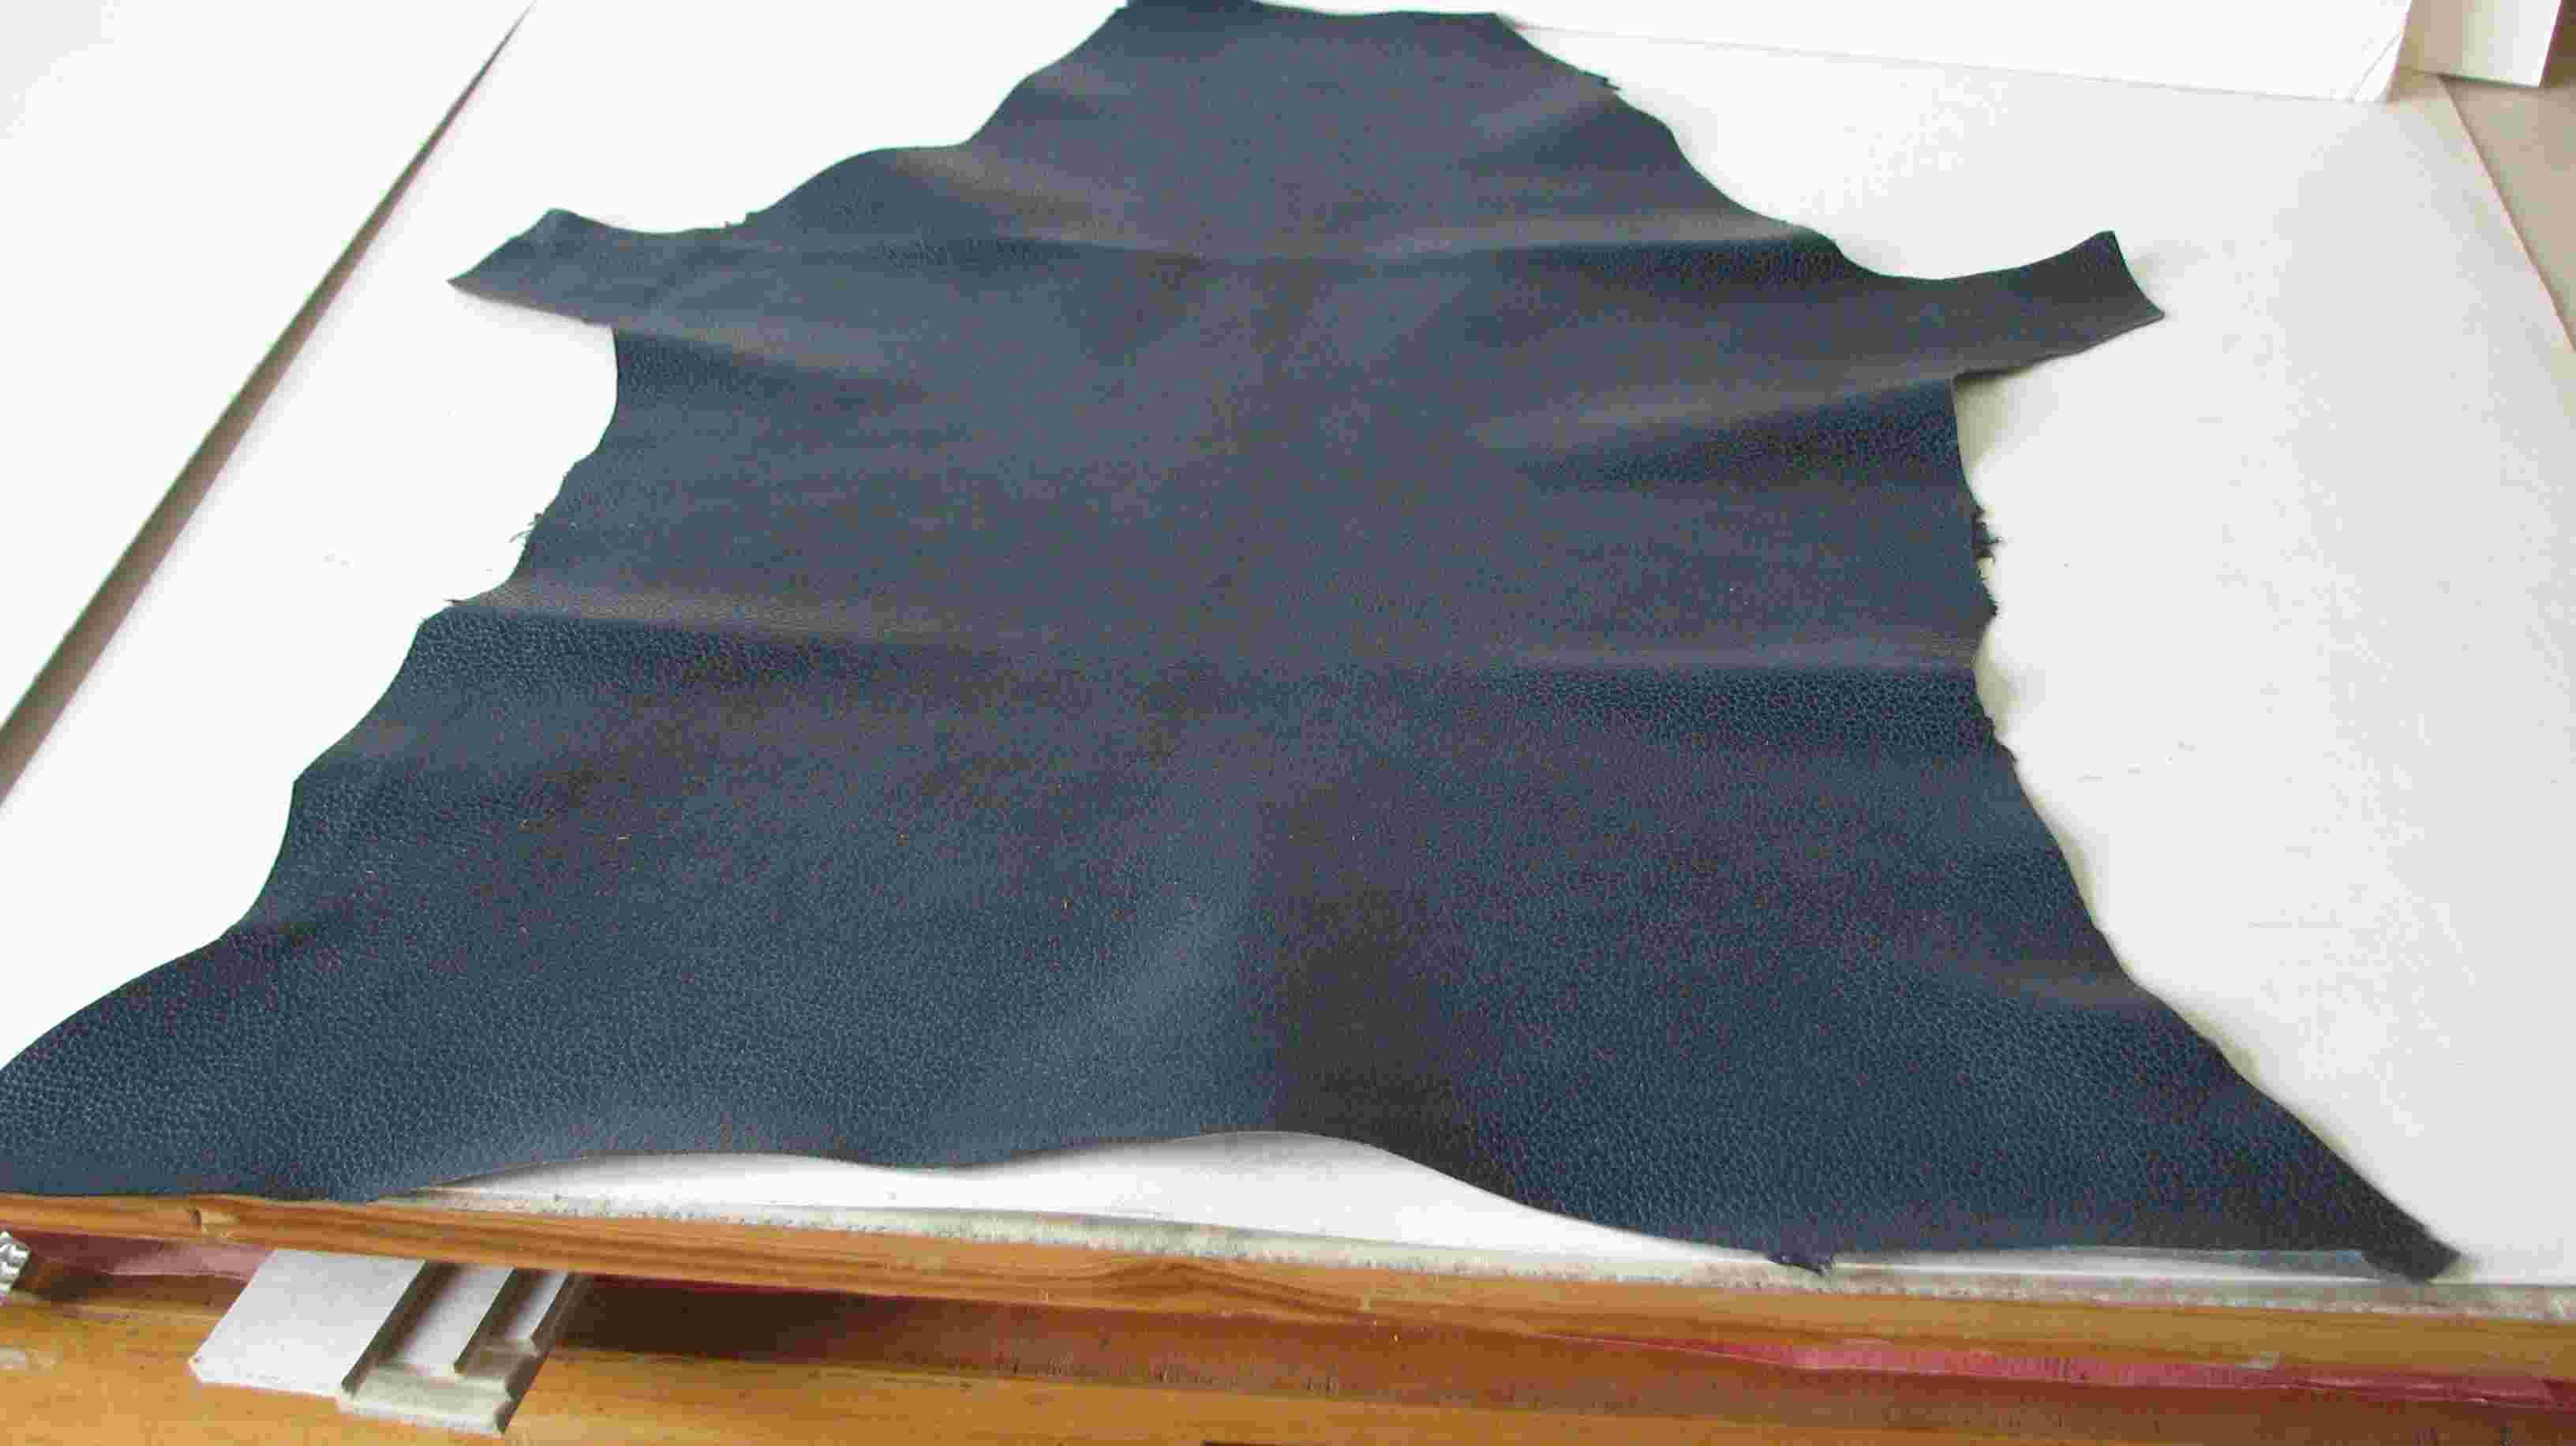 blauw-geverfd-italiaans-geiteleer-voor-gronings-gebedenboek-hs-add-360.jpg